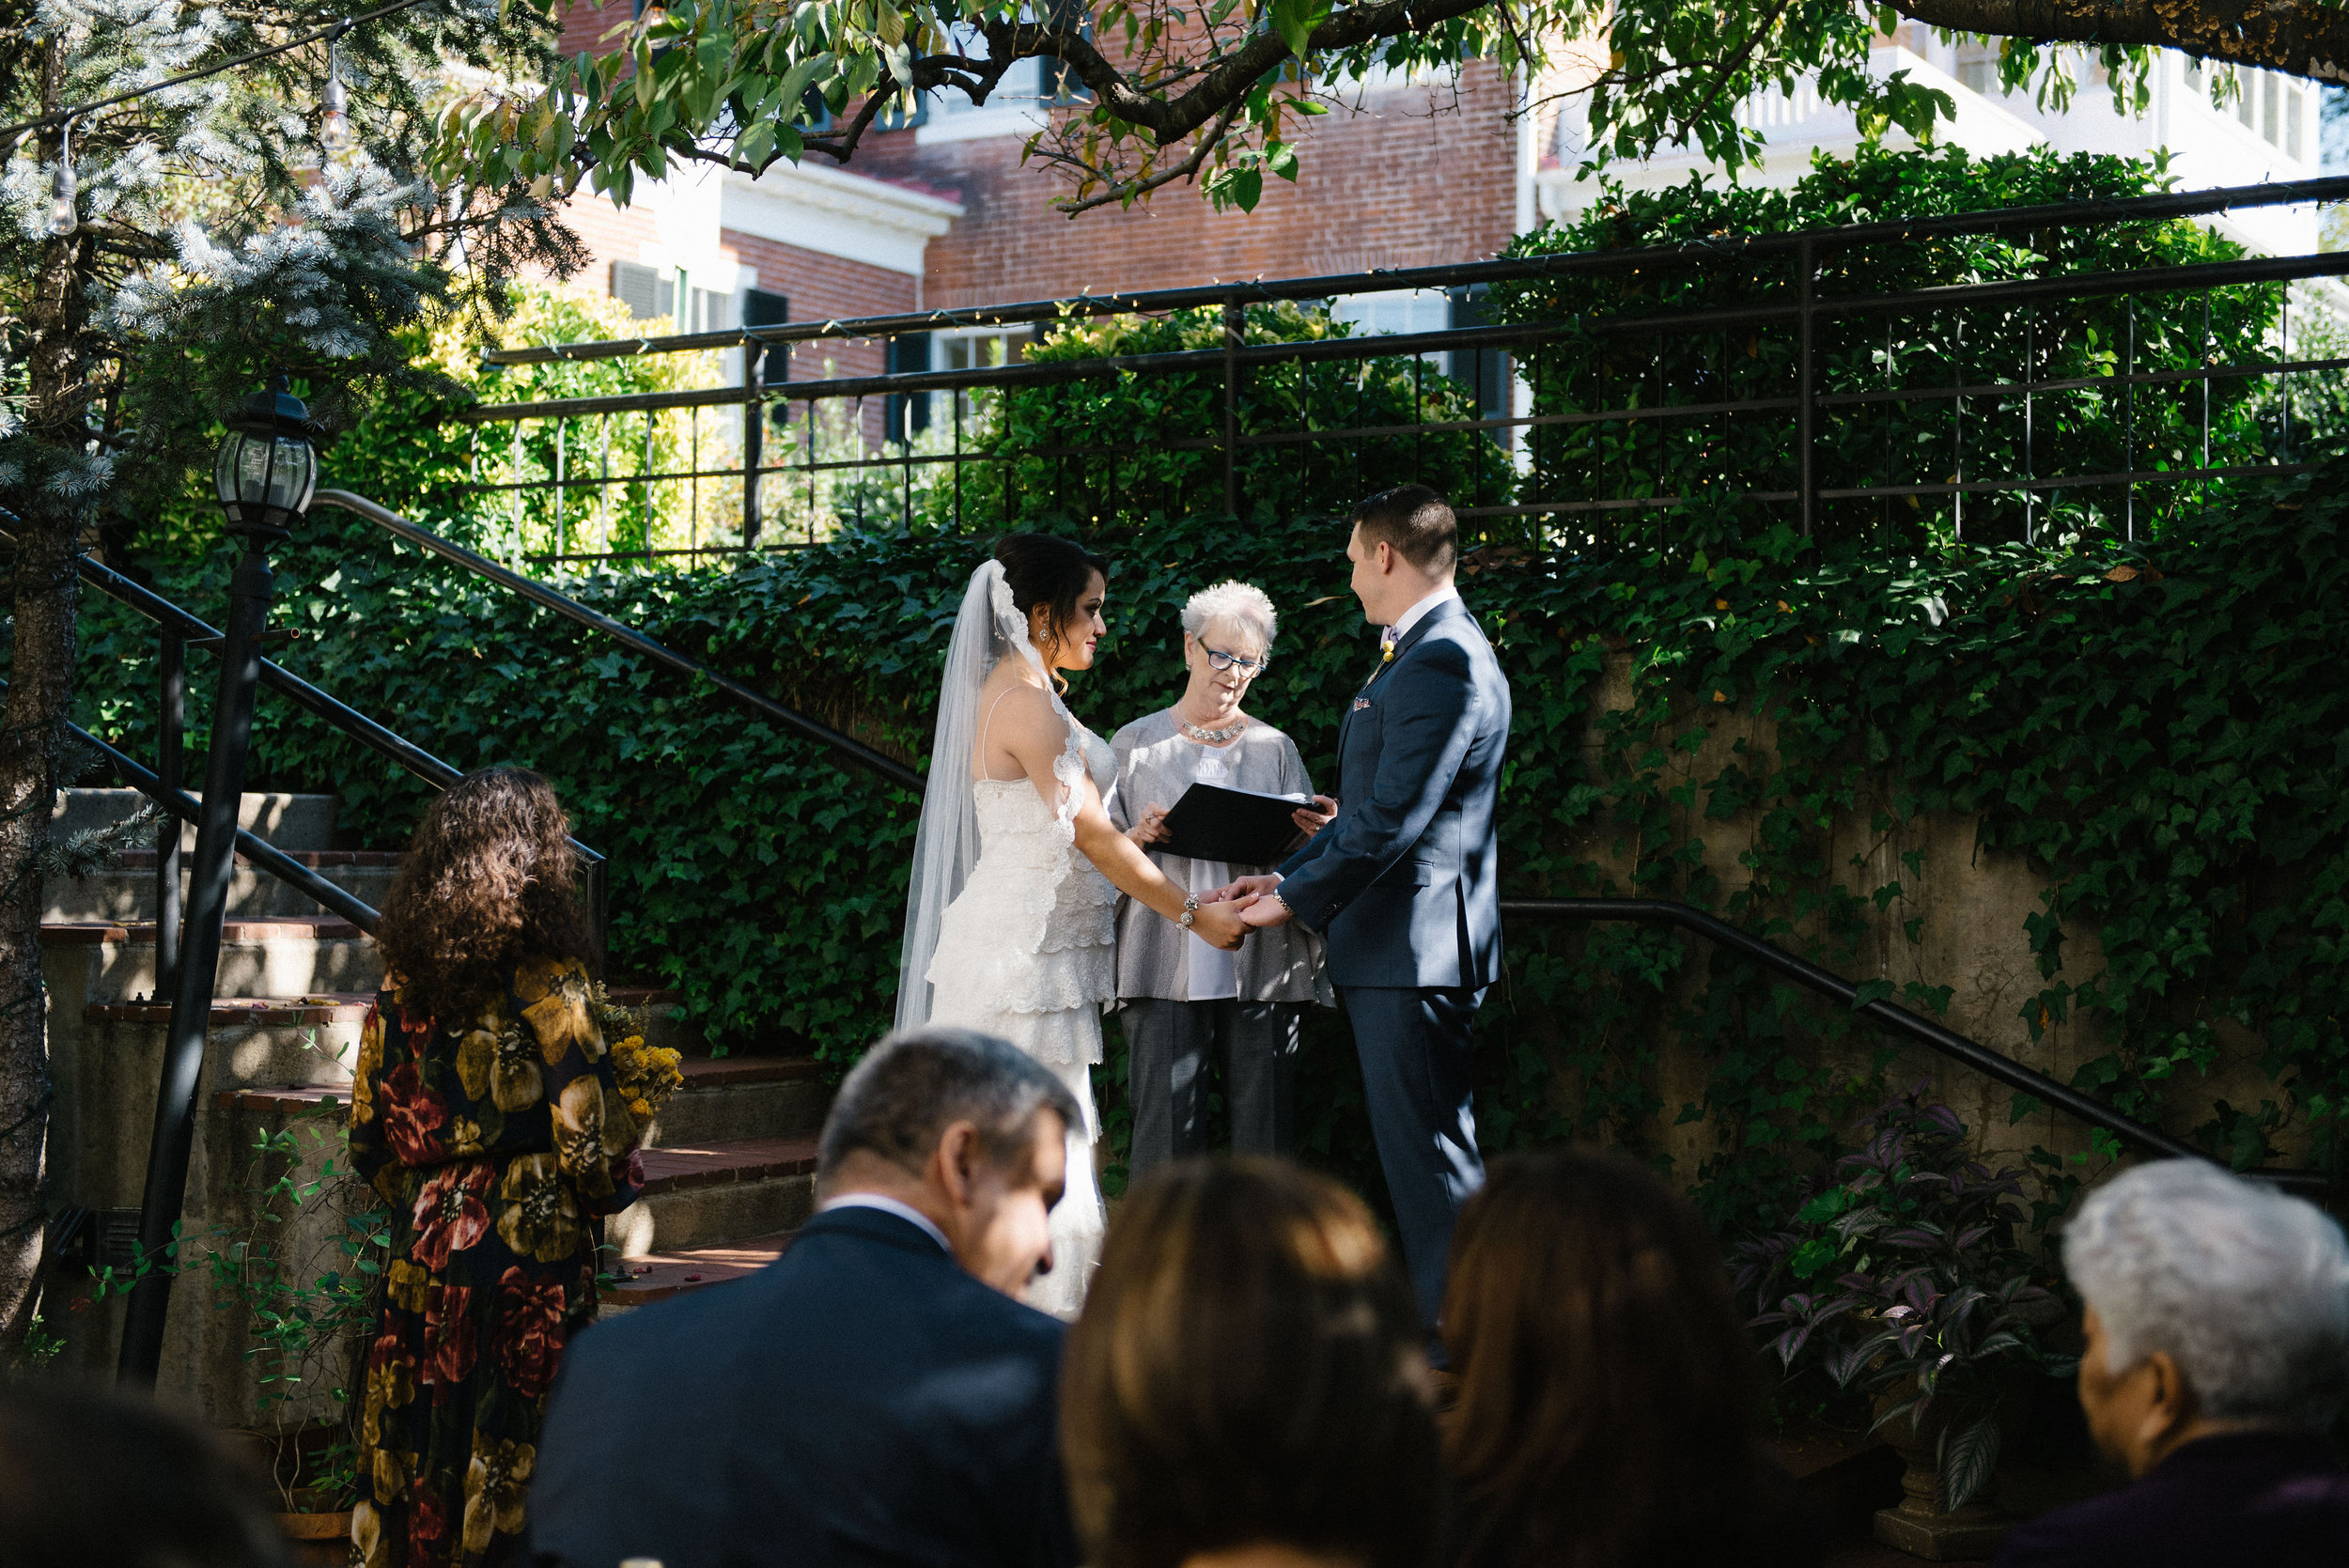 wedding-at-the-kenmore-inn.jpg